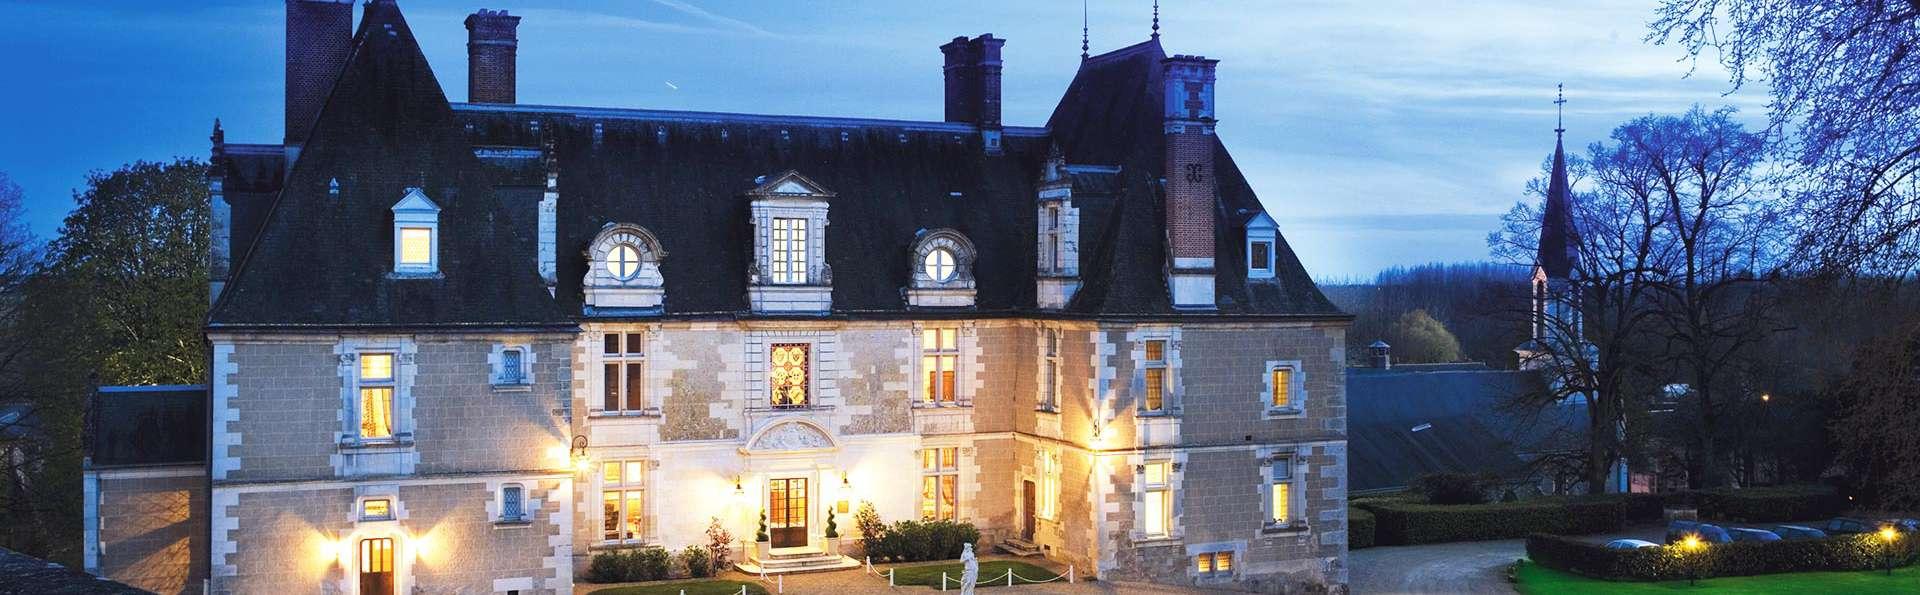 Château de Noizay - edit_facade2.jpg